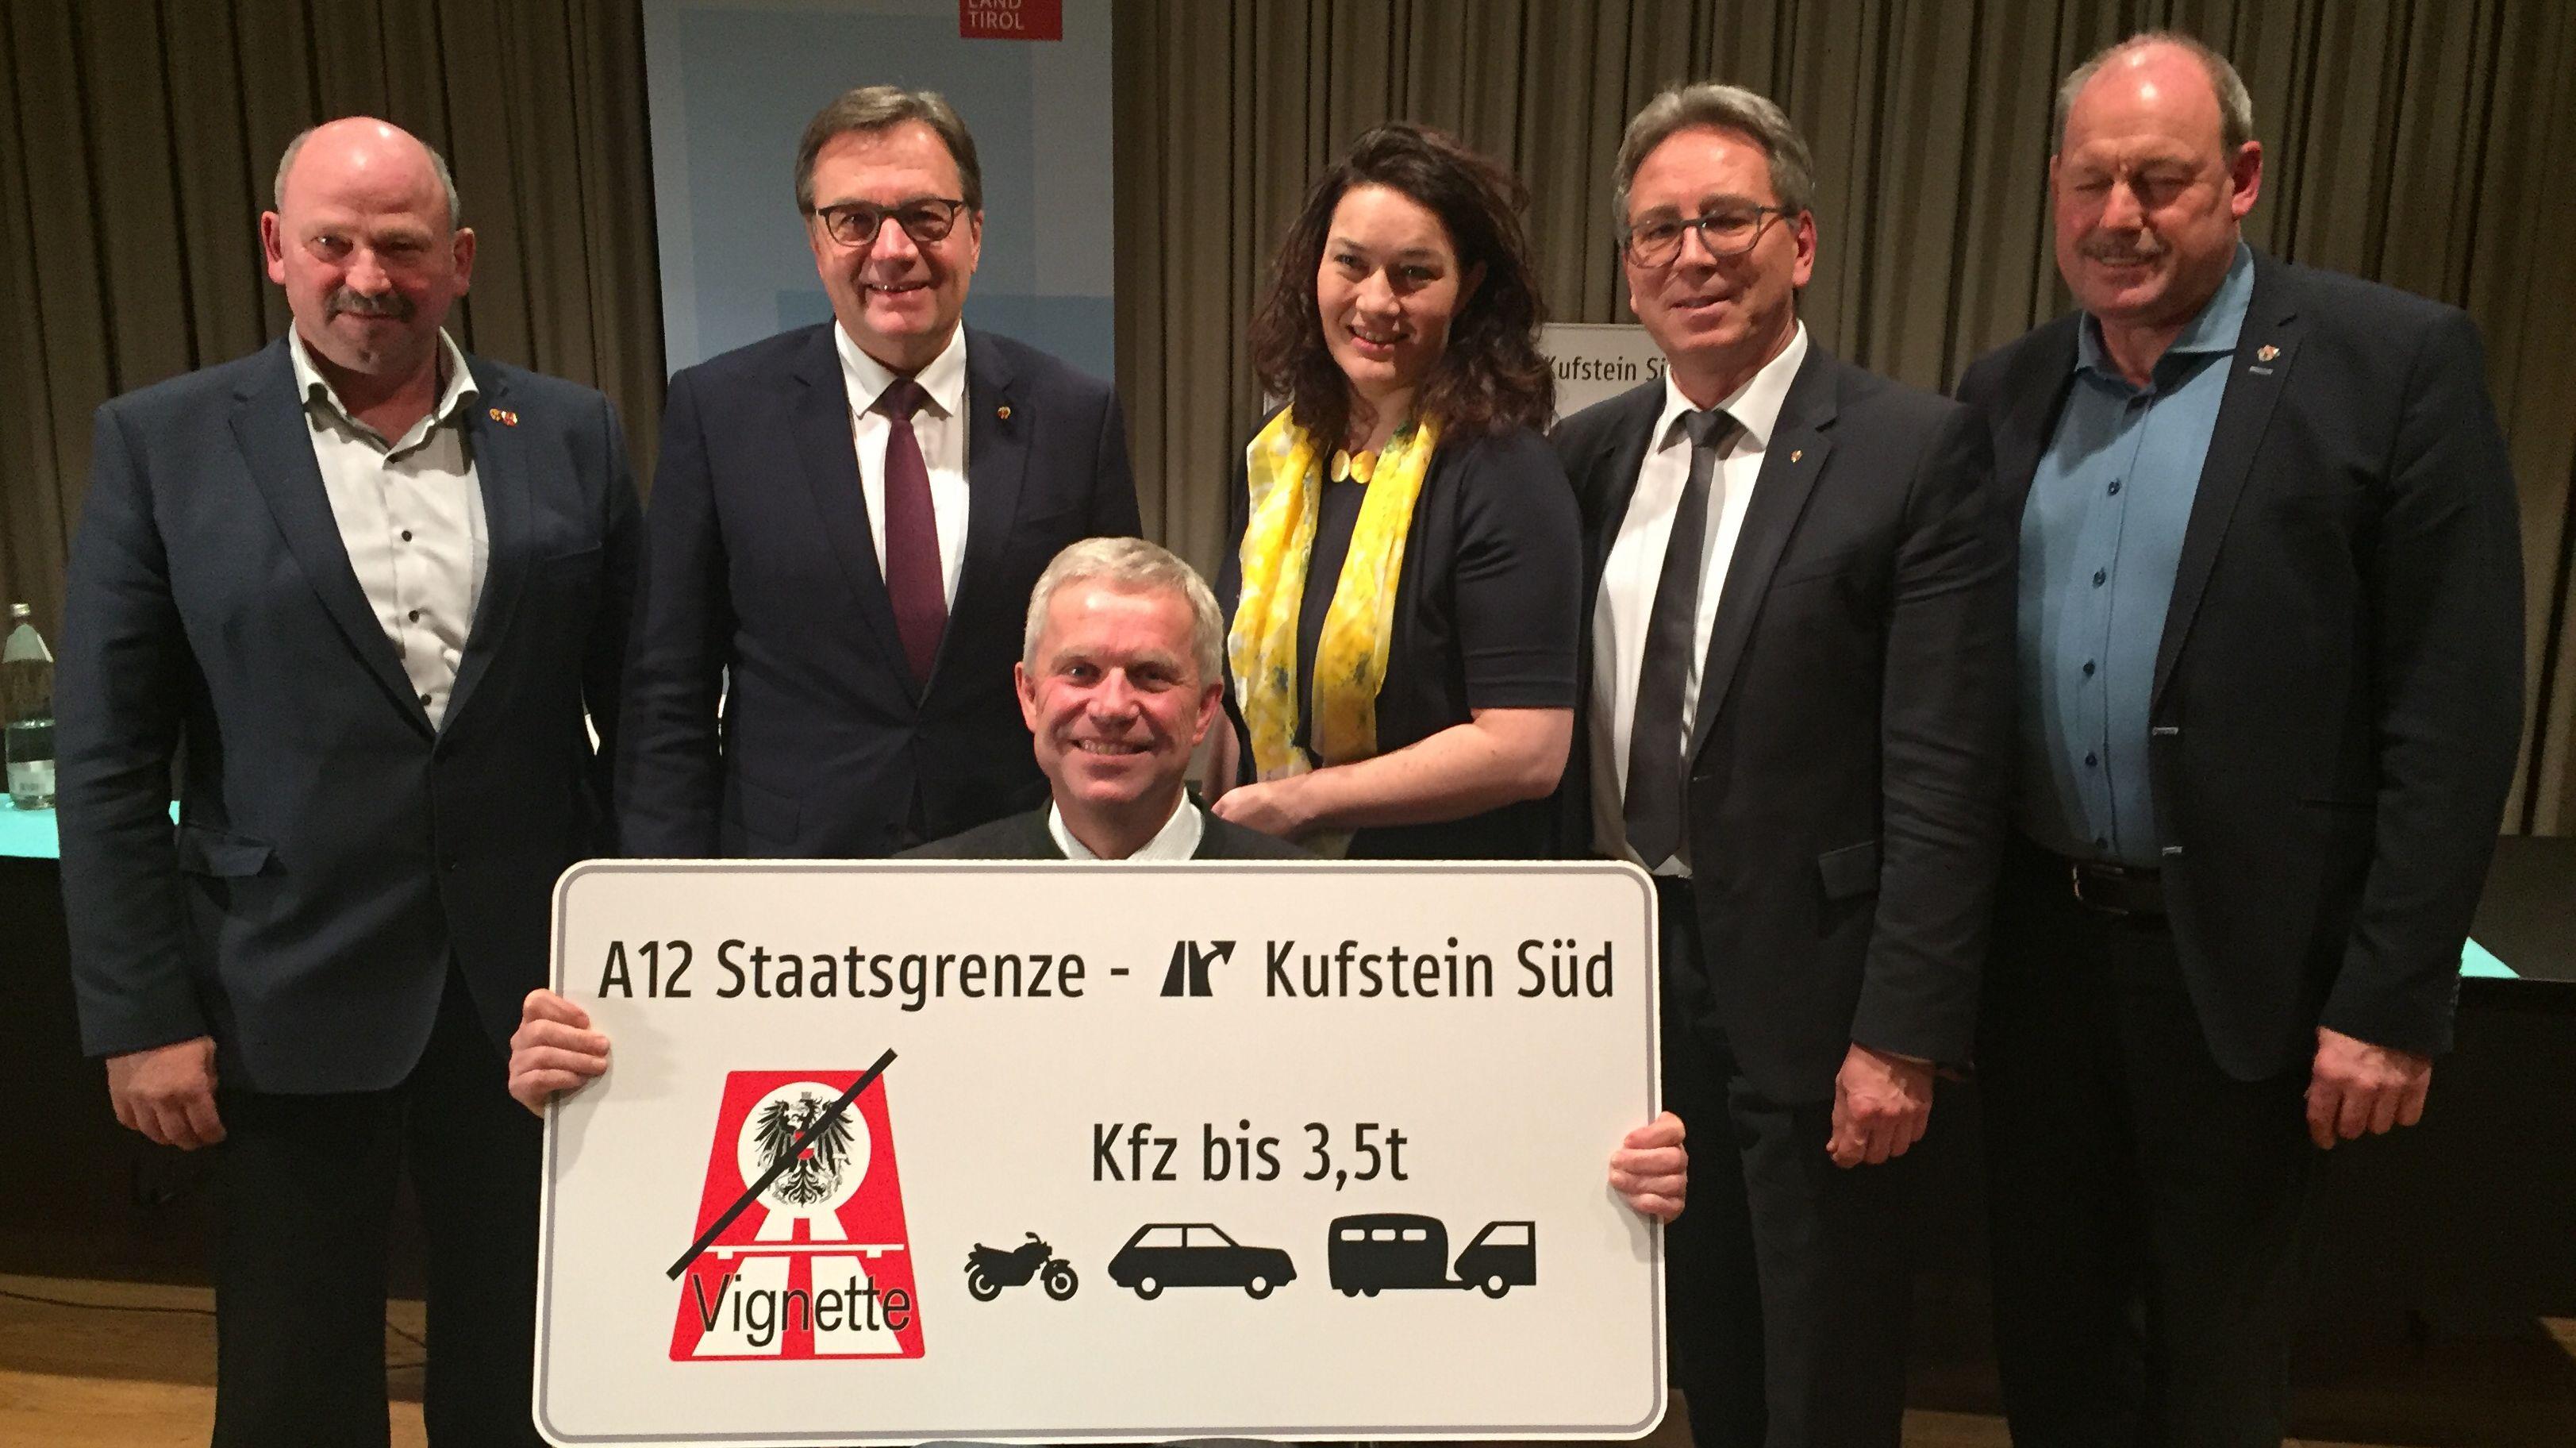 Gruppenbild mit dem Tiroler Landeshauptmann Günther Platter und dem Kiefersfeldener Bürgermeister Hajo Gruber (vorne)